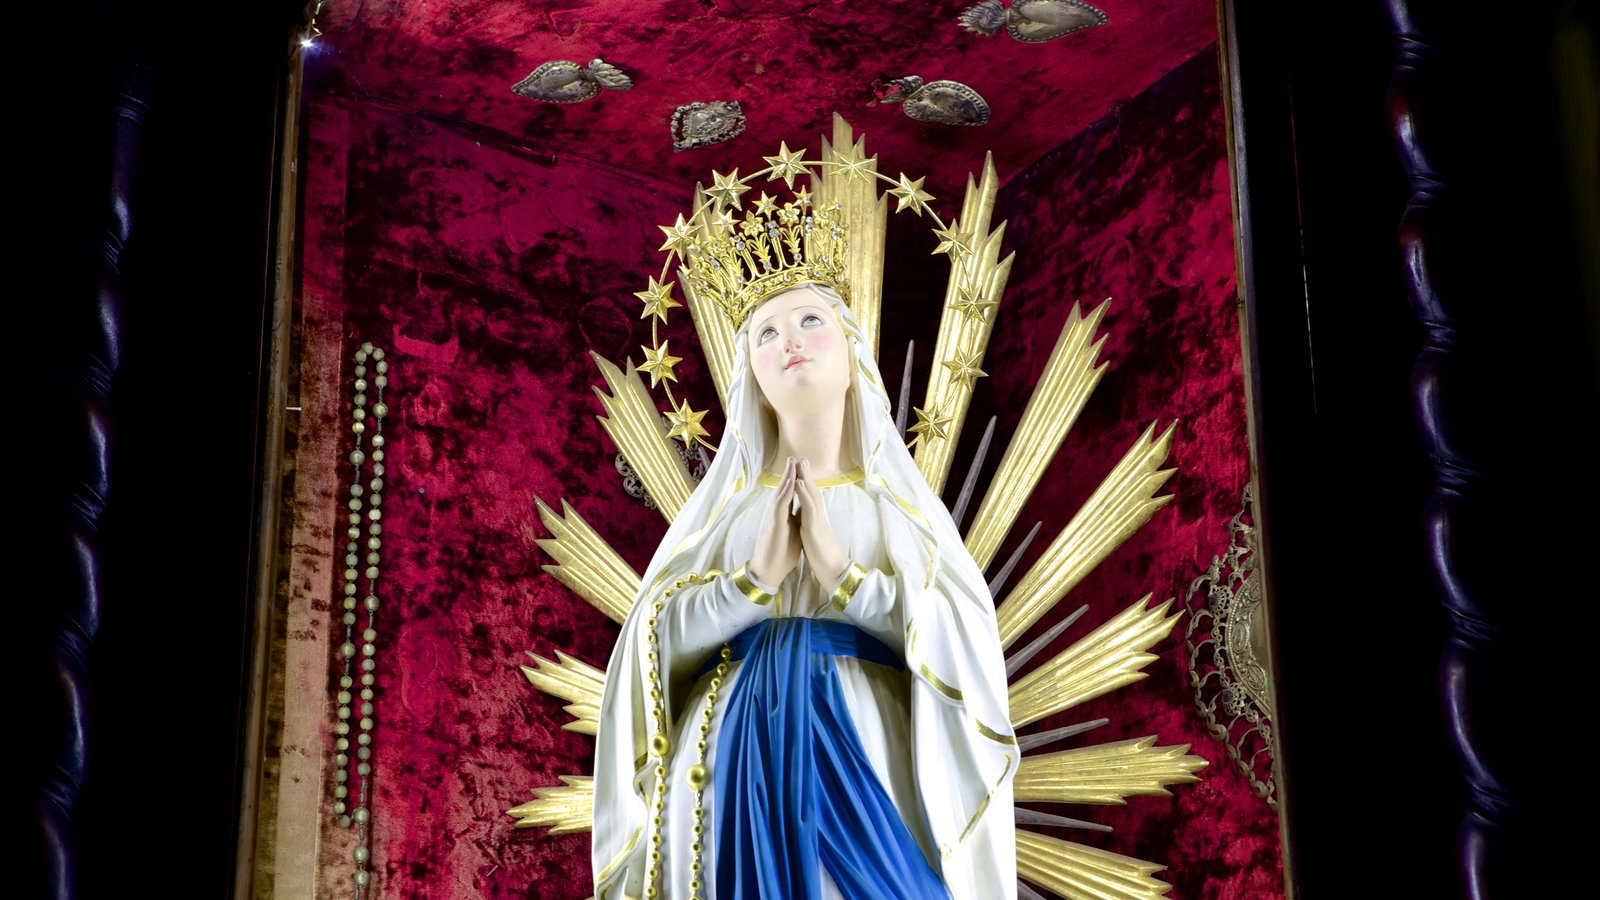 La Valeta ofreciendo una estatua o escultura, una iglesia o catedral y vistas interiores